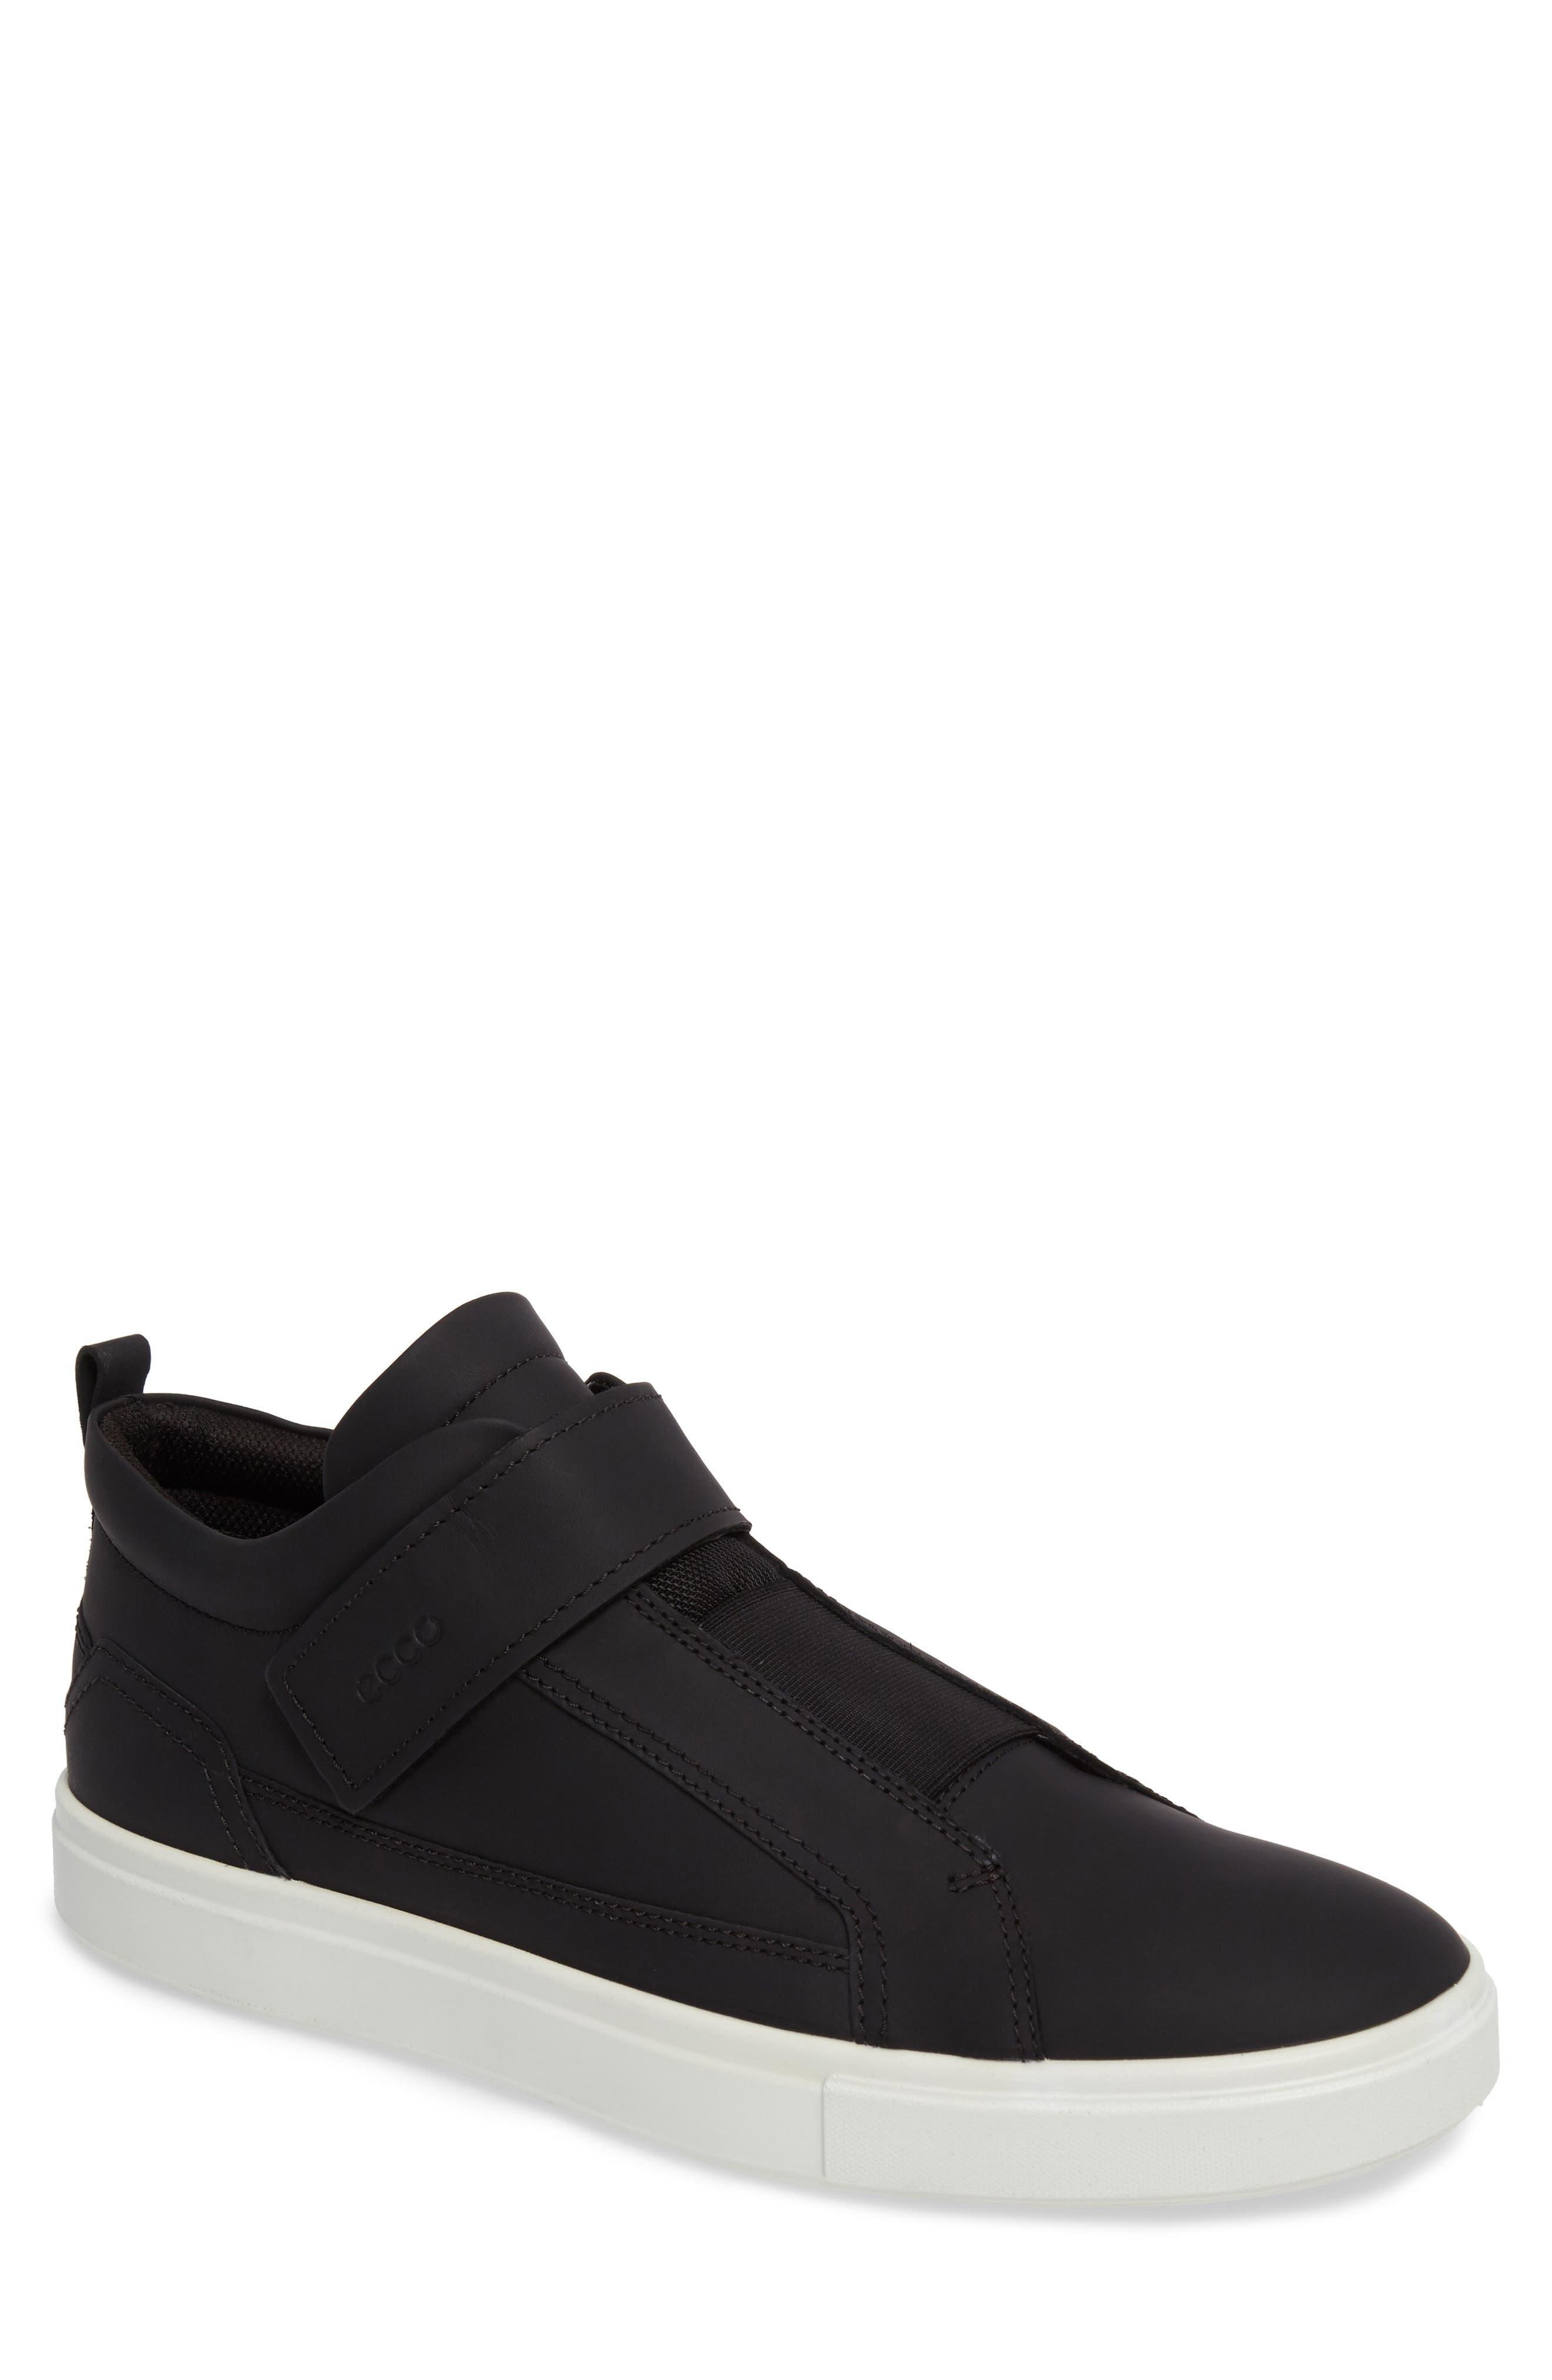 Kyle Sneaker,                             Main thumbnail 1, color,                             001